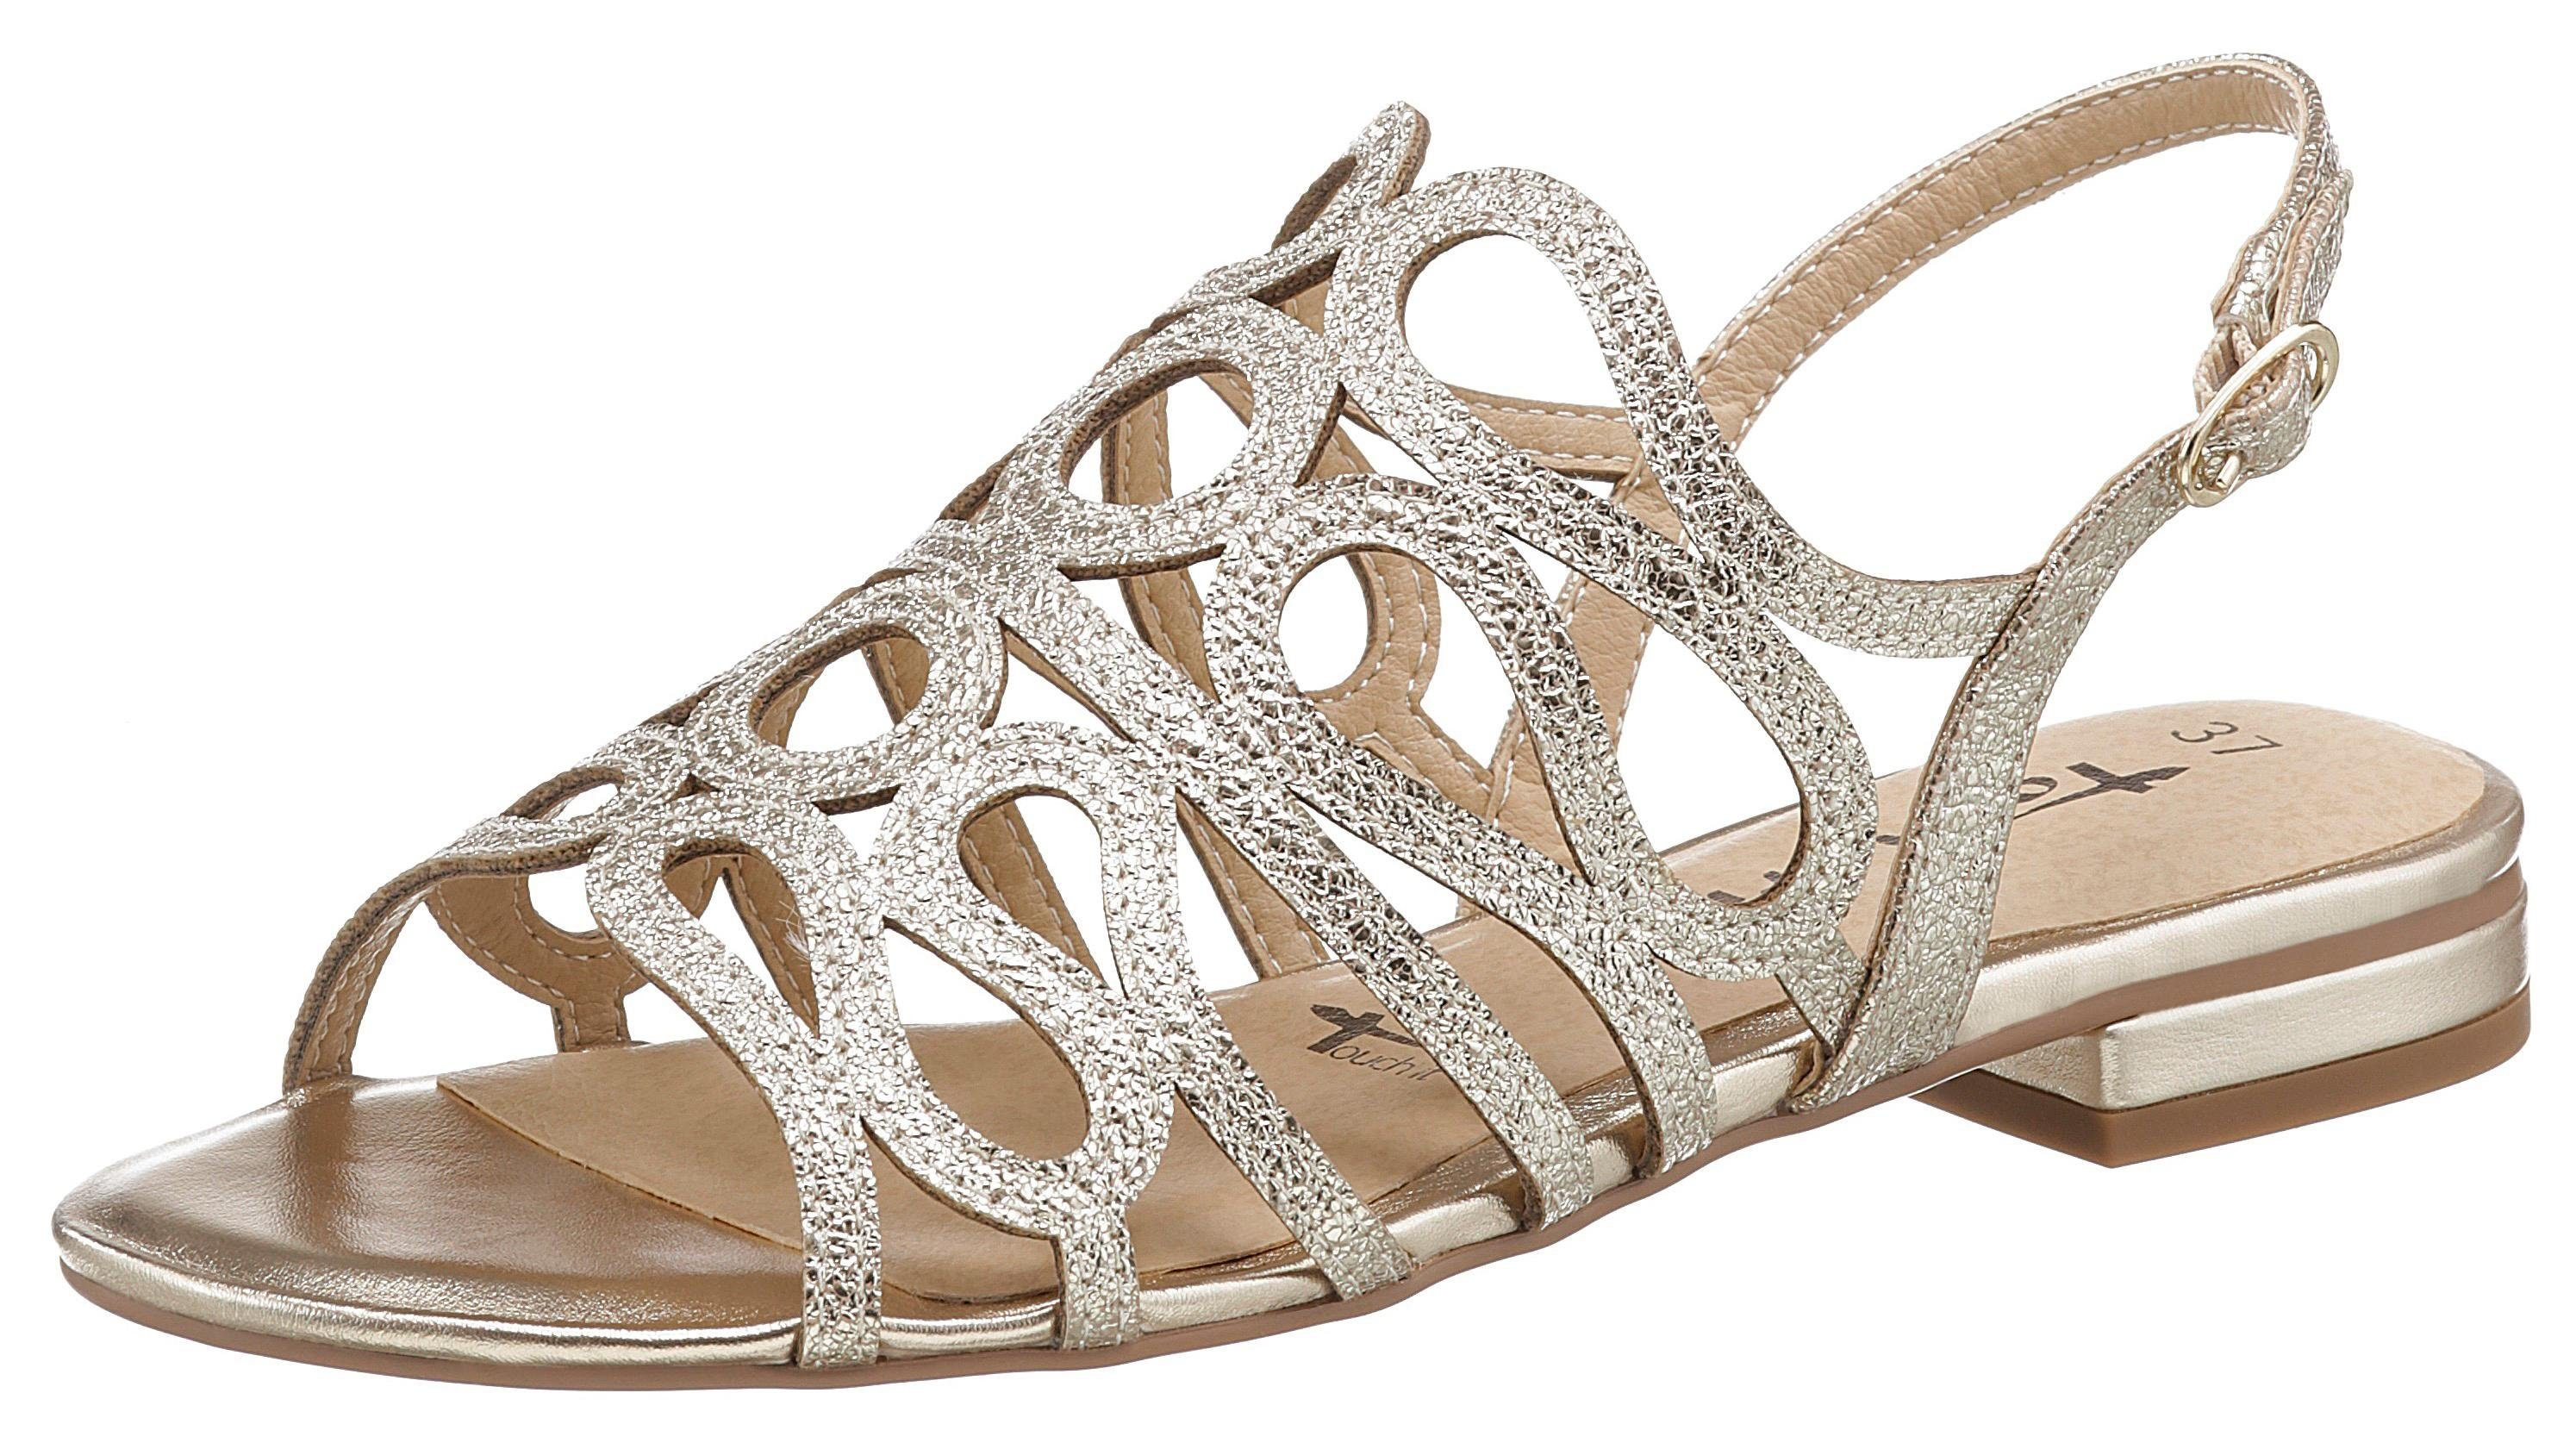 Tamaris »Ayn« Sandalette in Crinkle Optik kaufen   OTTO